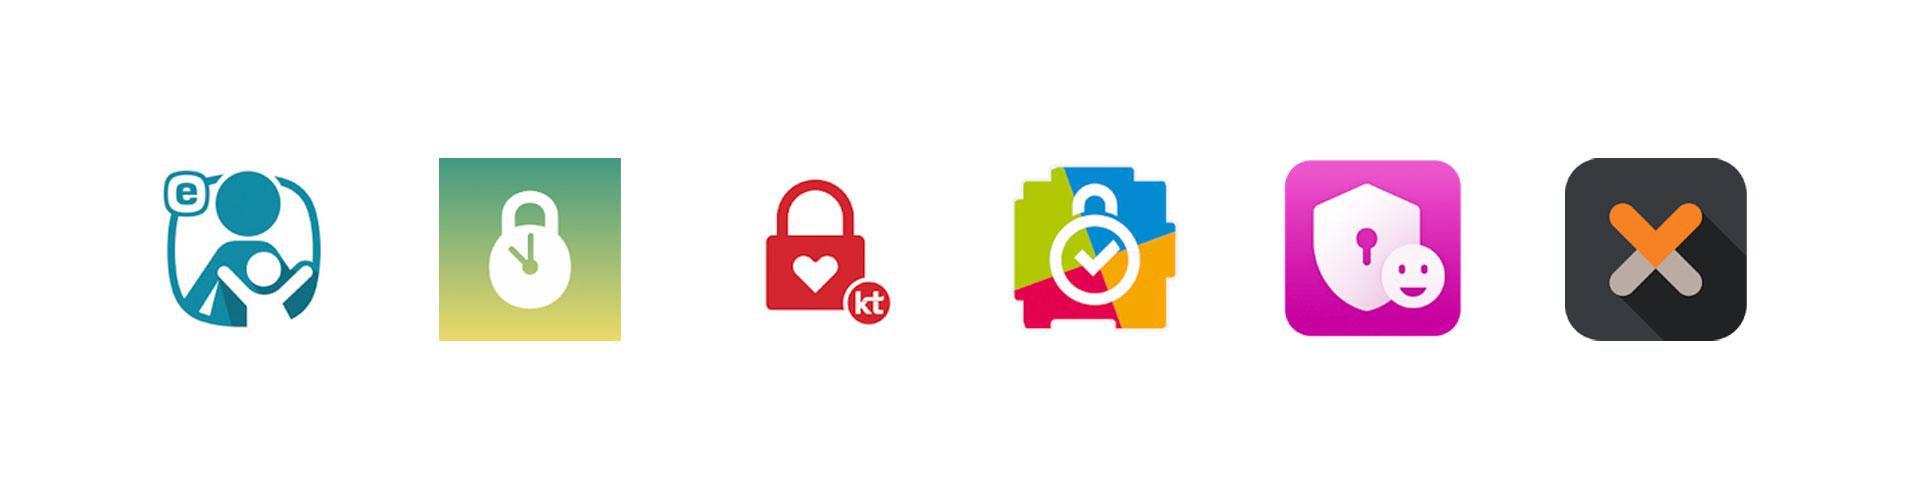 skt, 키즈, 시간관리, 사용관리앱